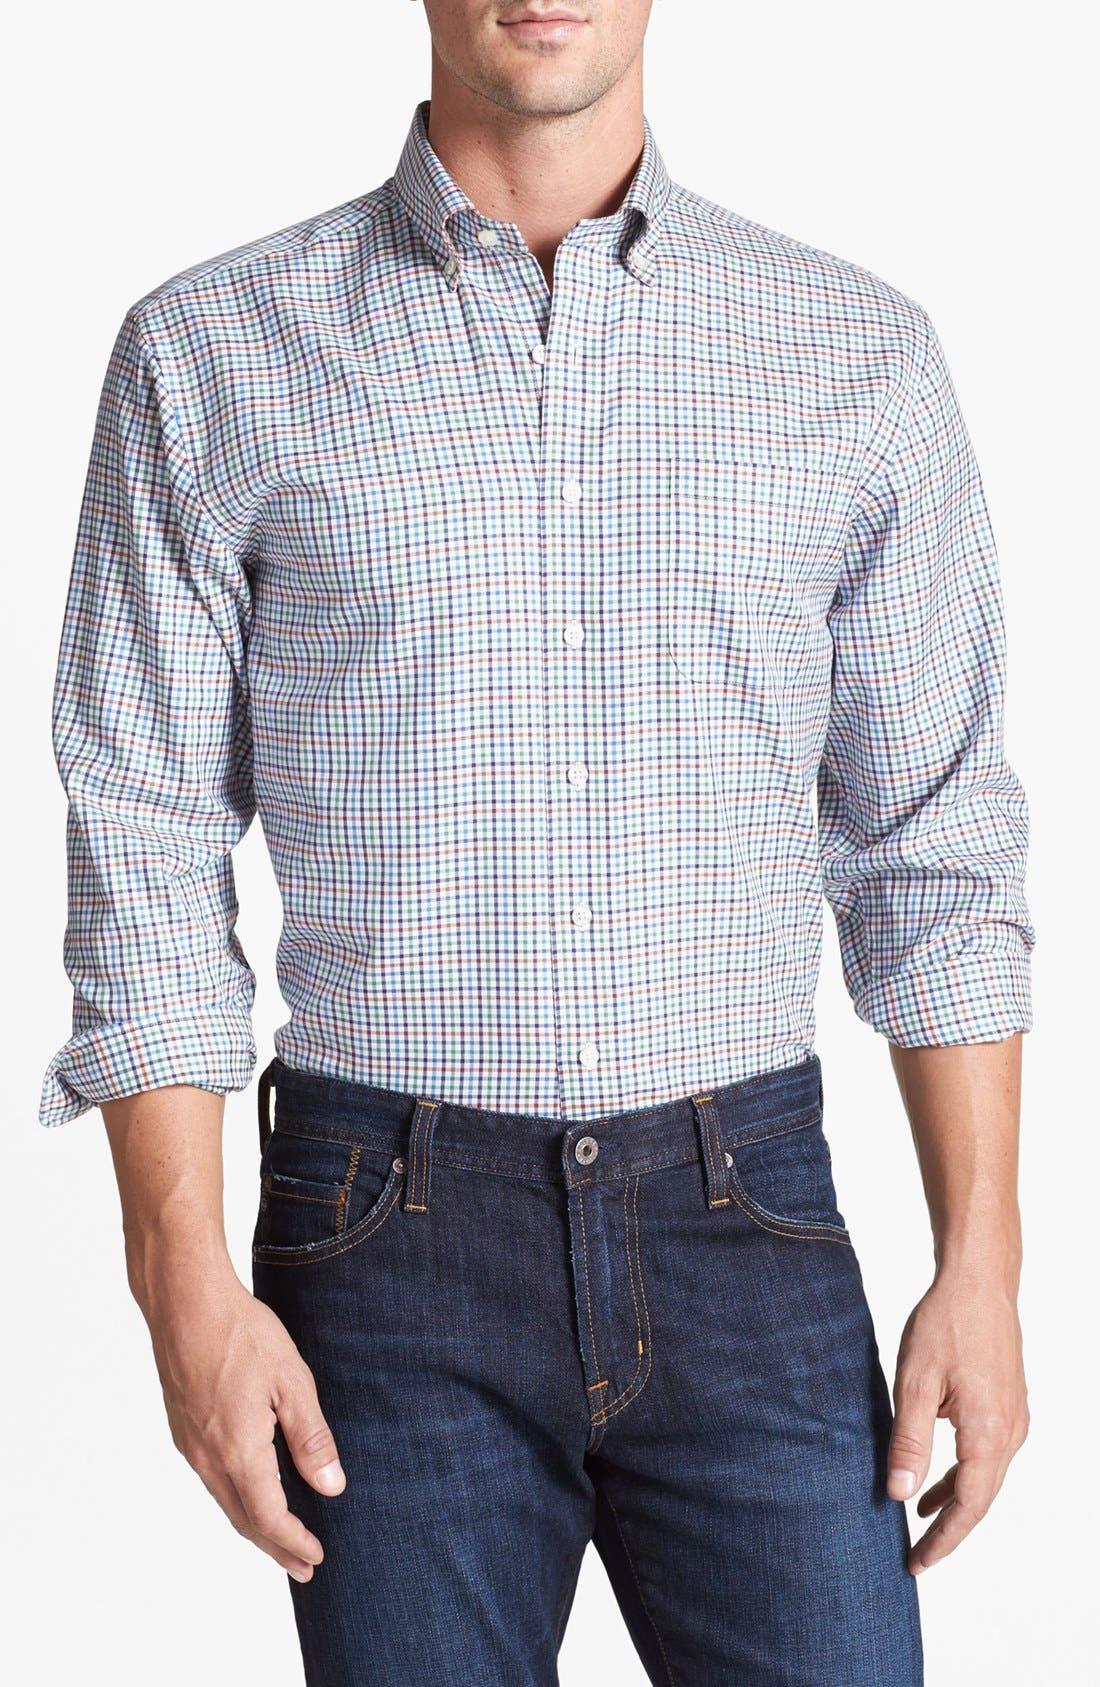 Alternate Image 1 Selected - Vineyard Vines 'Murray Sedgwick' Regular Fit Check Sport Shirt